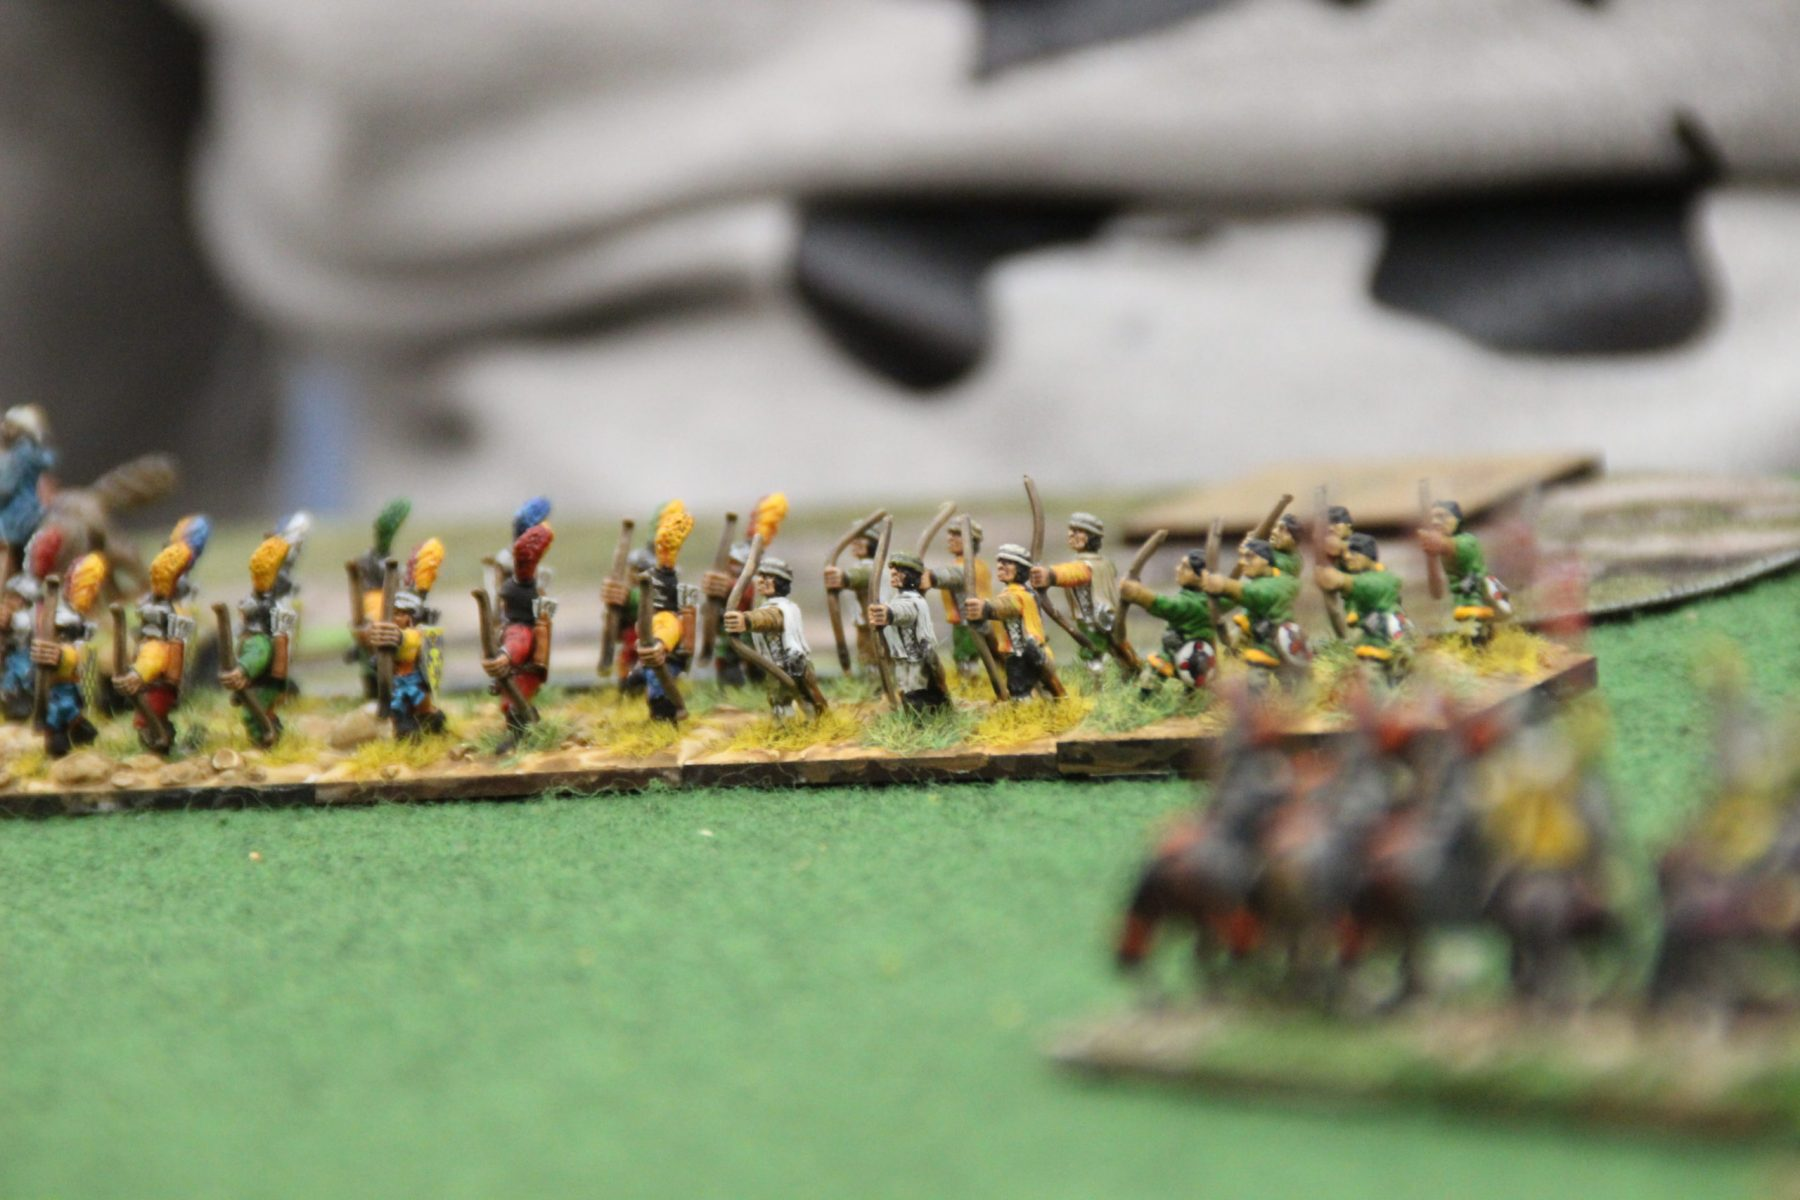 Archers longs anglo-irlandais en rangs compacts.